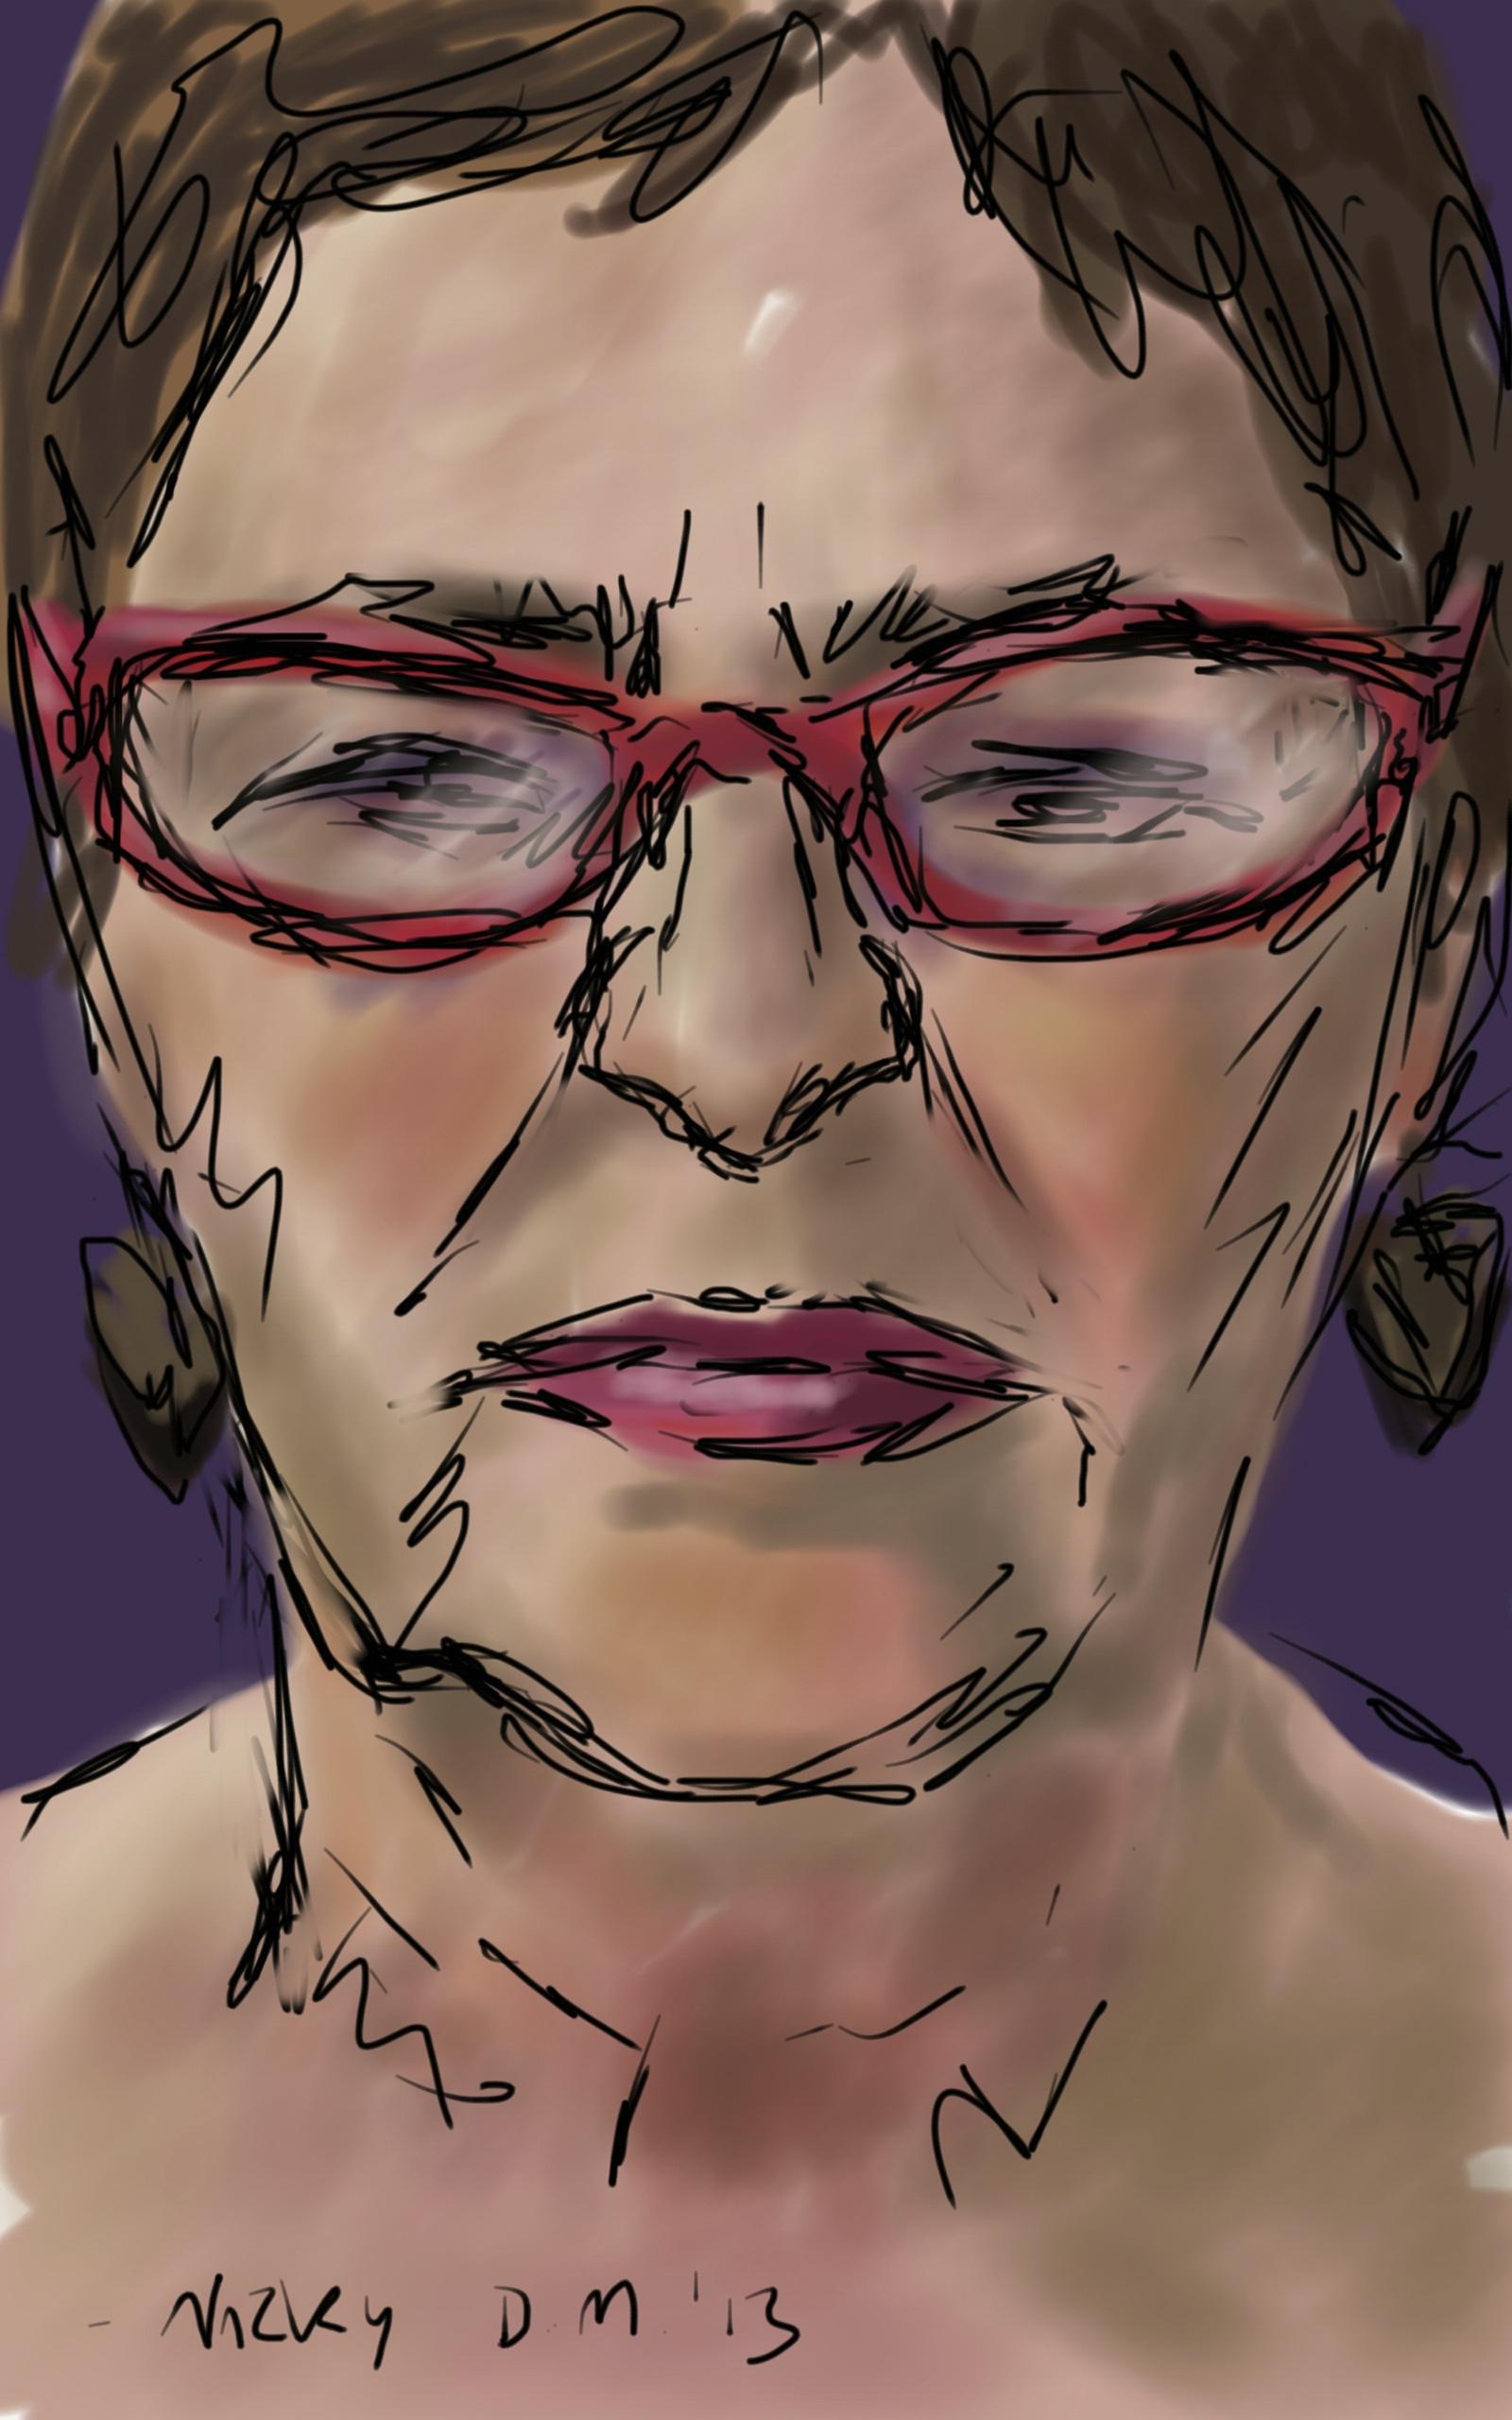 Danny Mooney 'Nicky 6.4.13' Digital Drawing